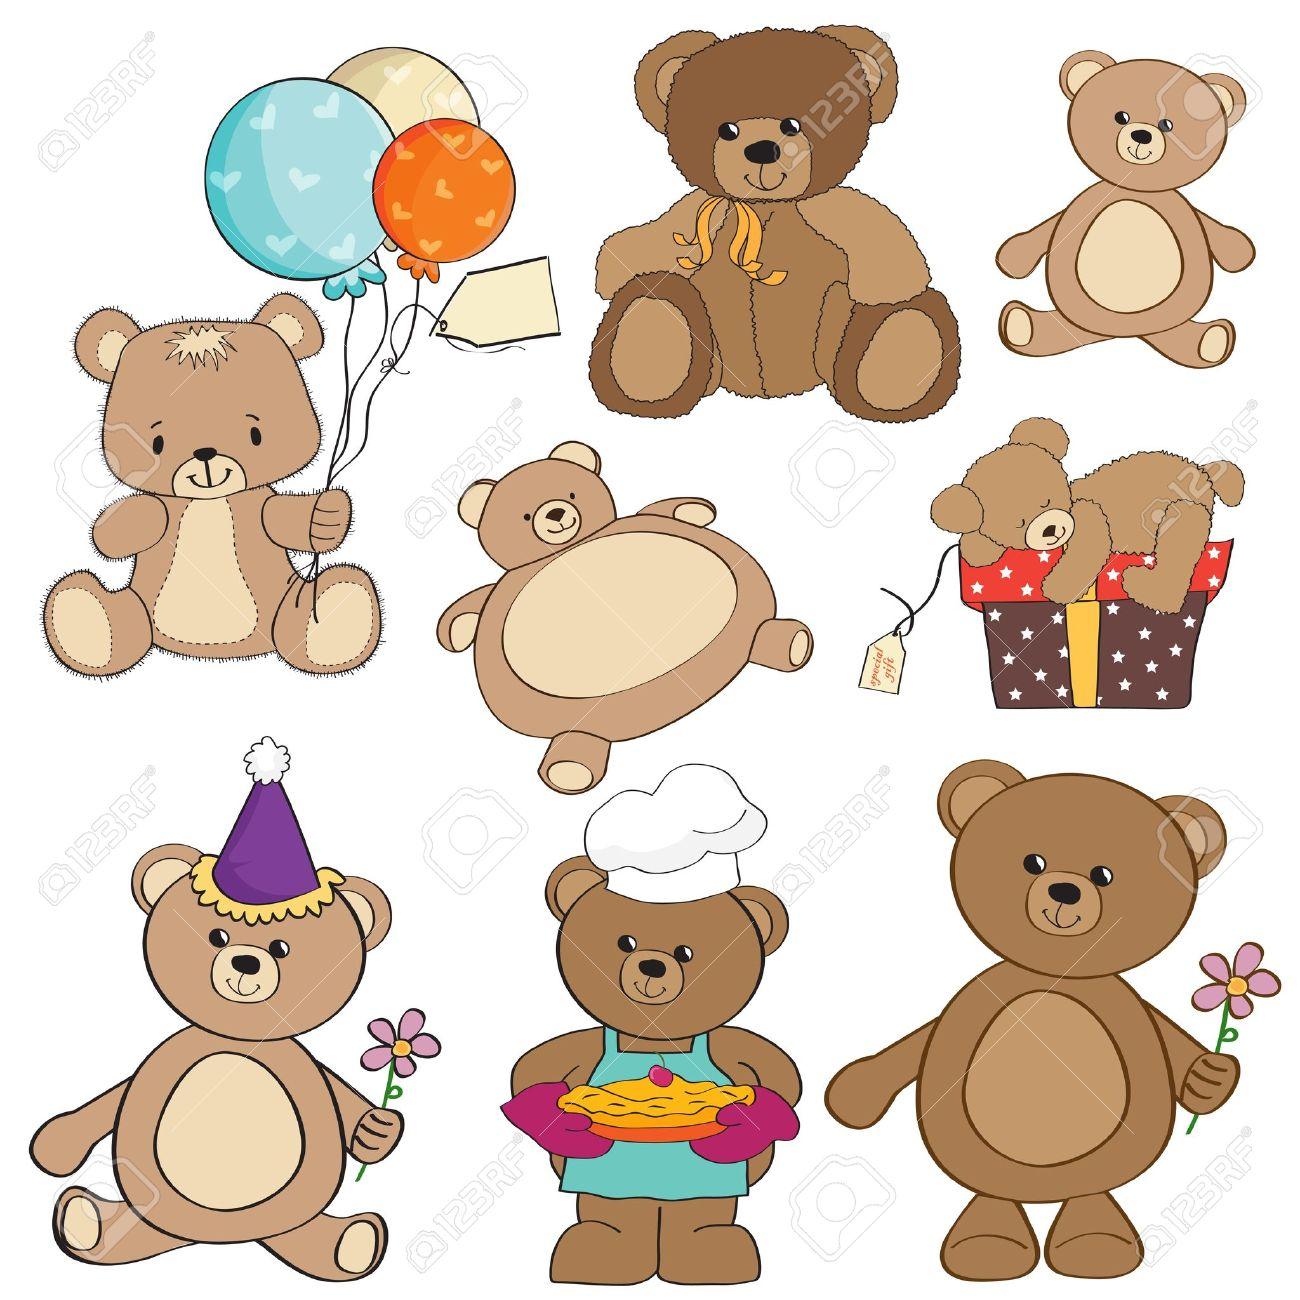 How To Design A Teddy Bear Fusmun